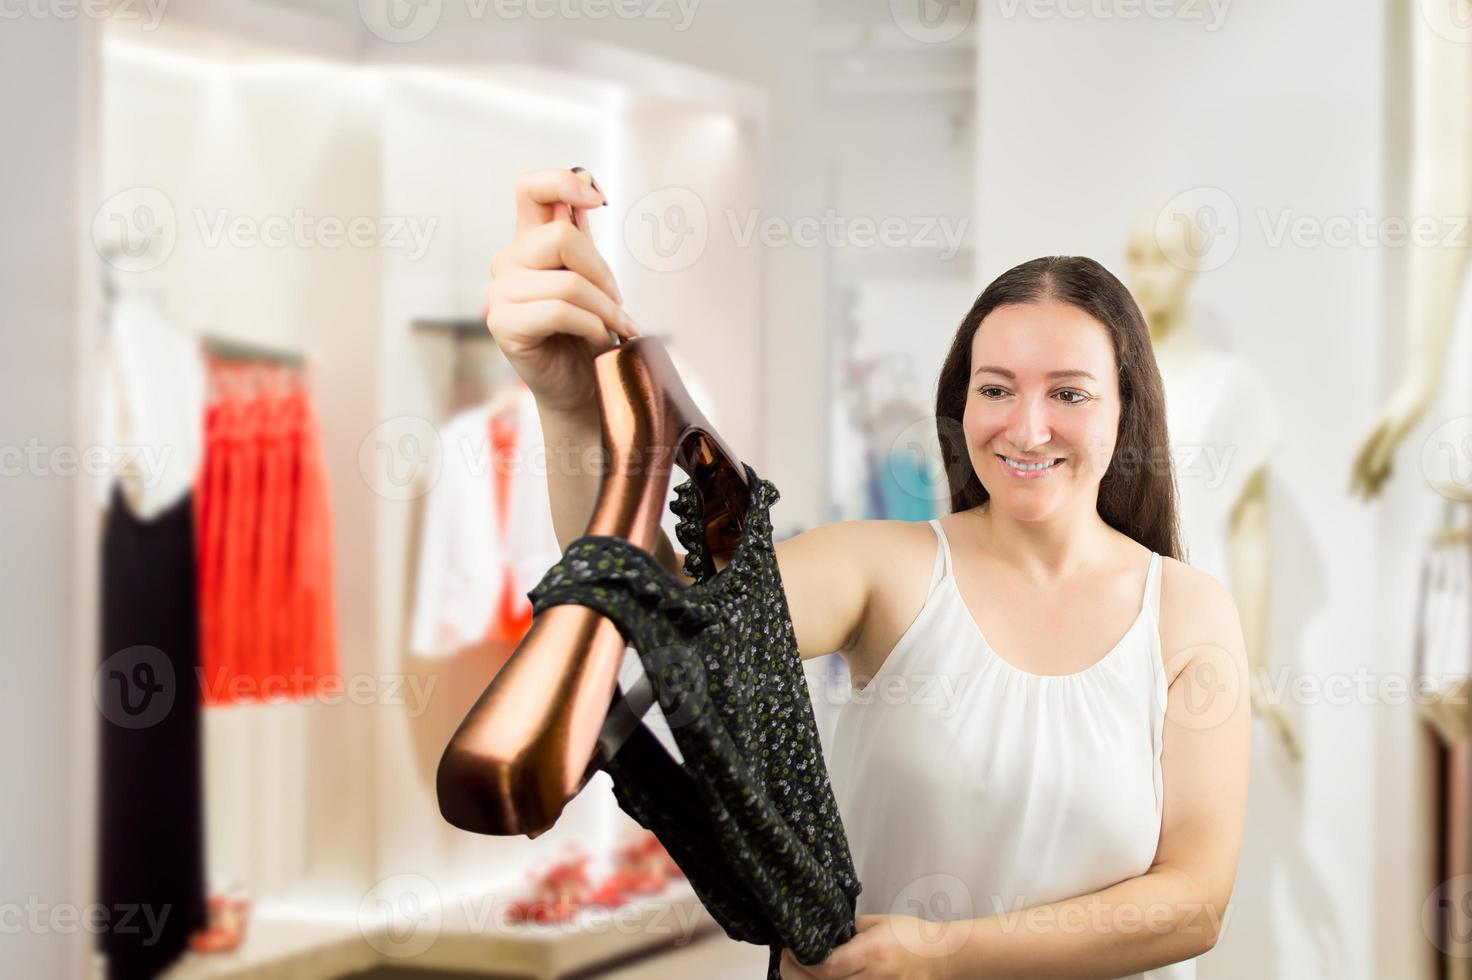 j'aime cette robe photo